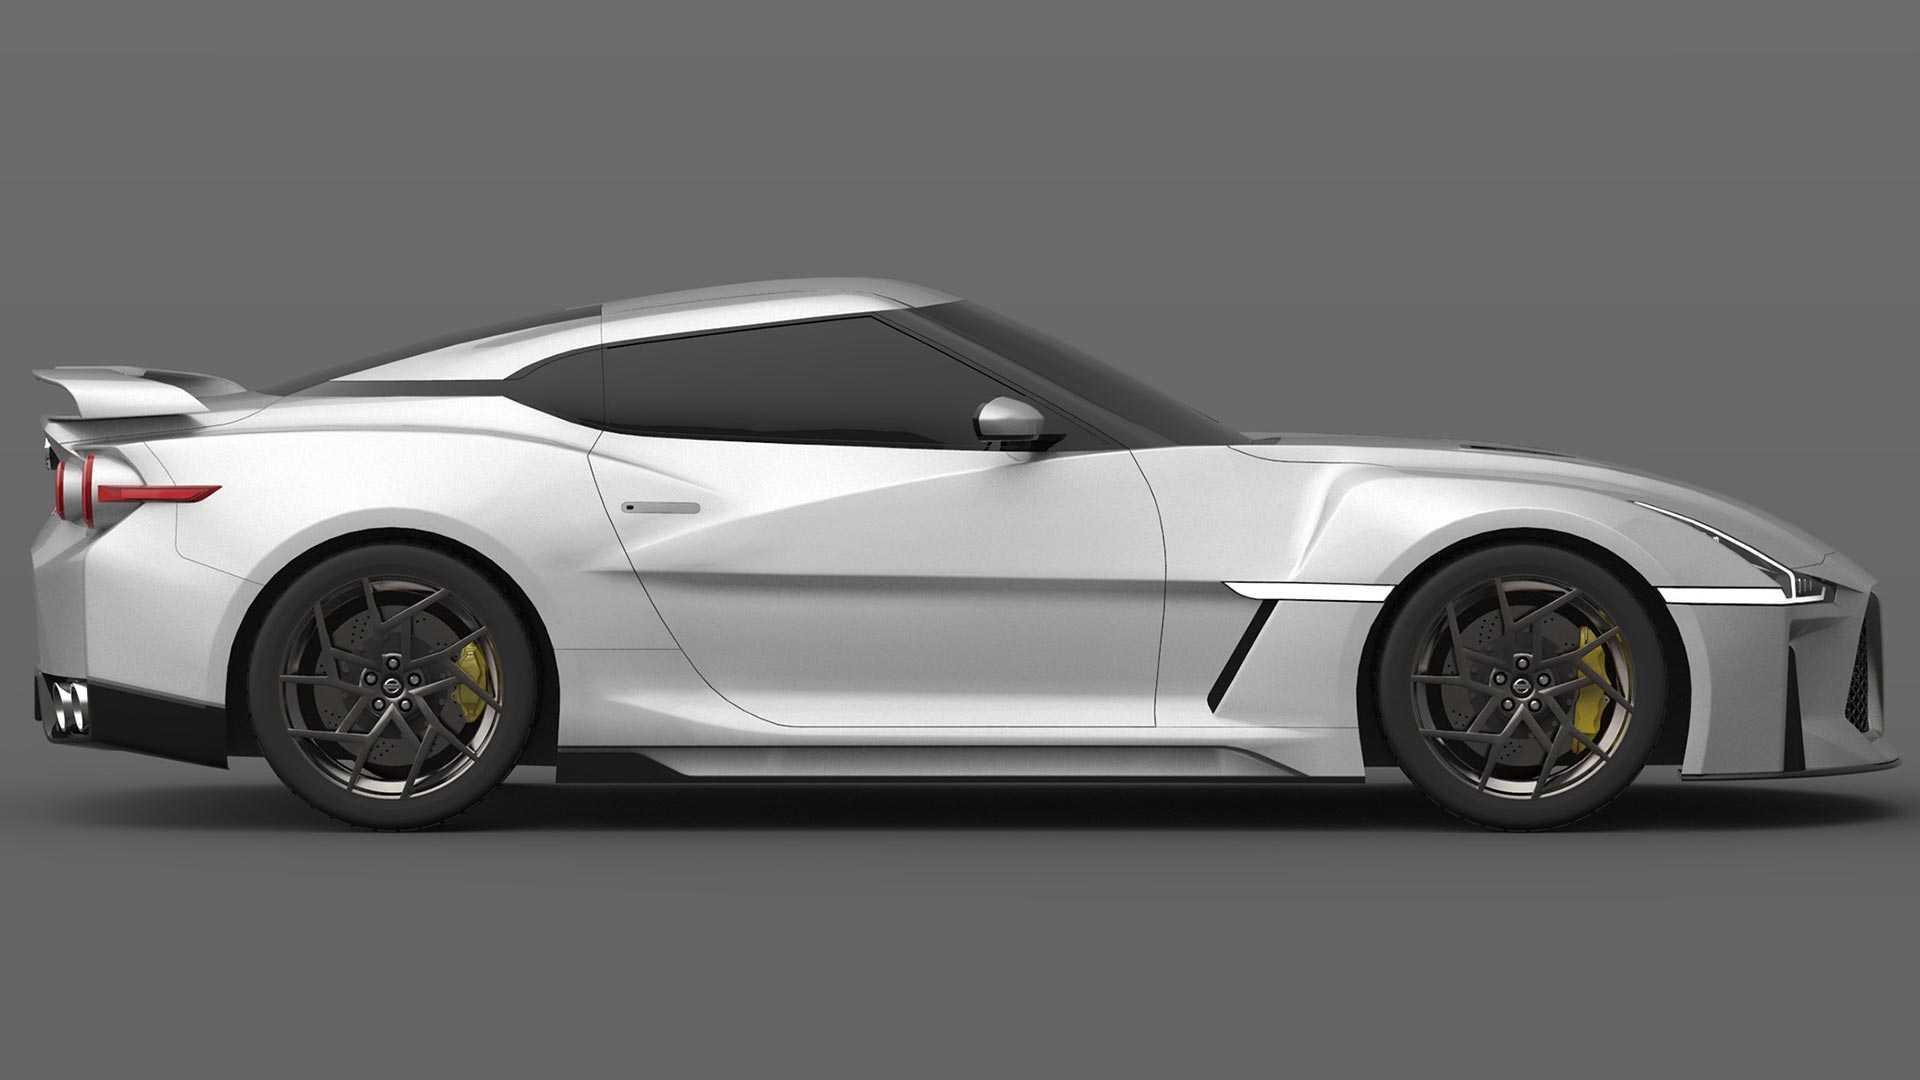 11 Gallery of Nissan Z Car 2020 Release Date by Nissan Z Car 2020